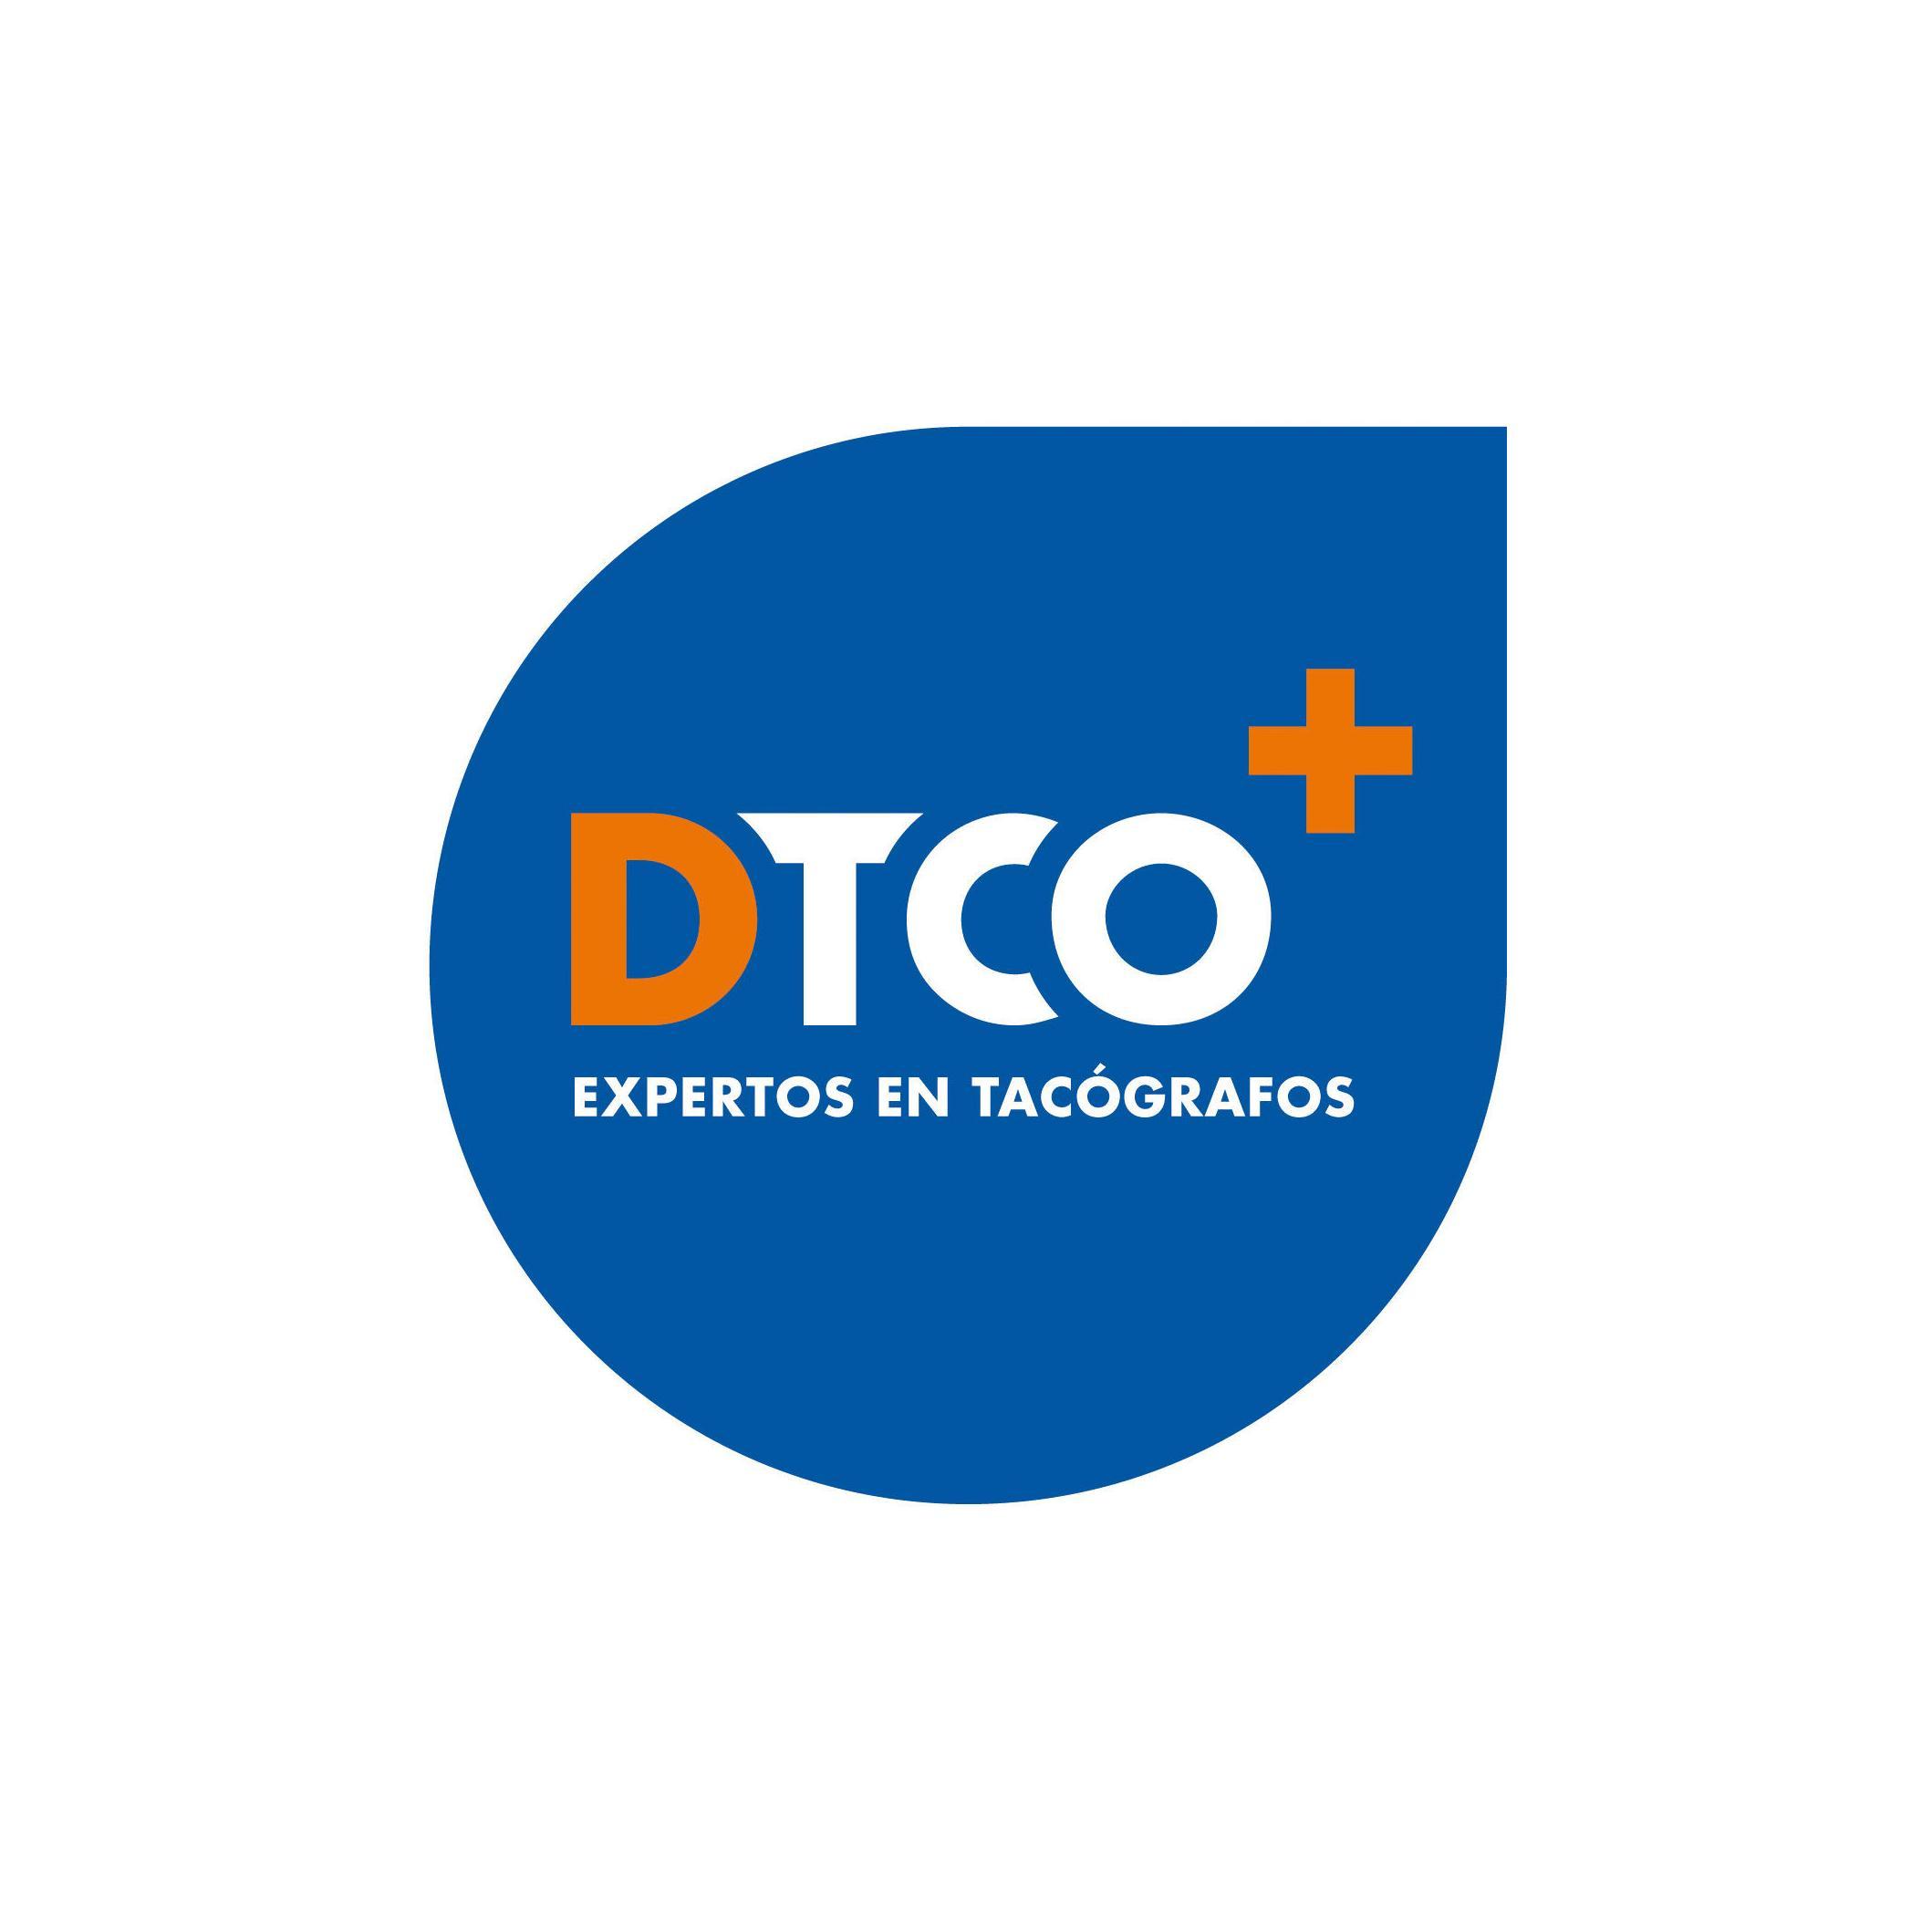 DTCO+